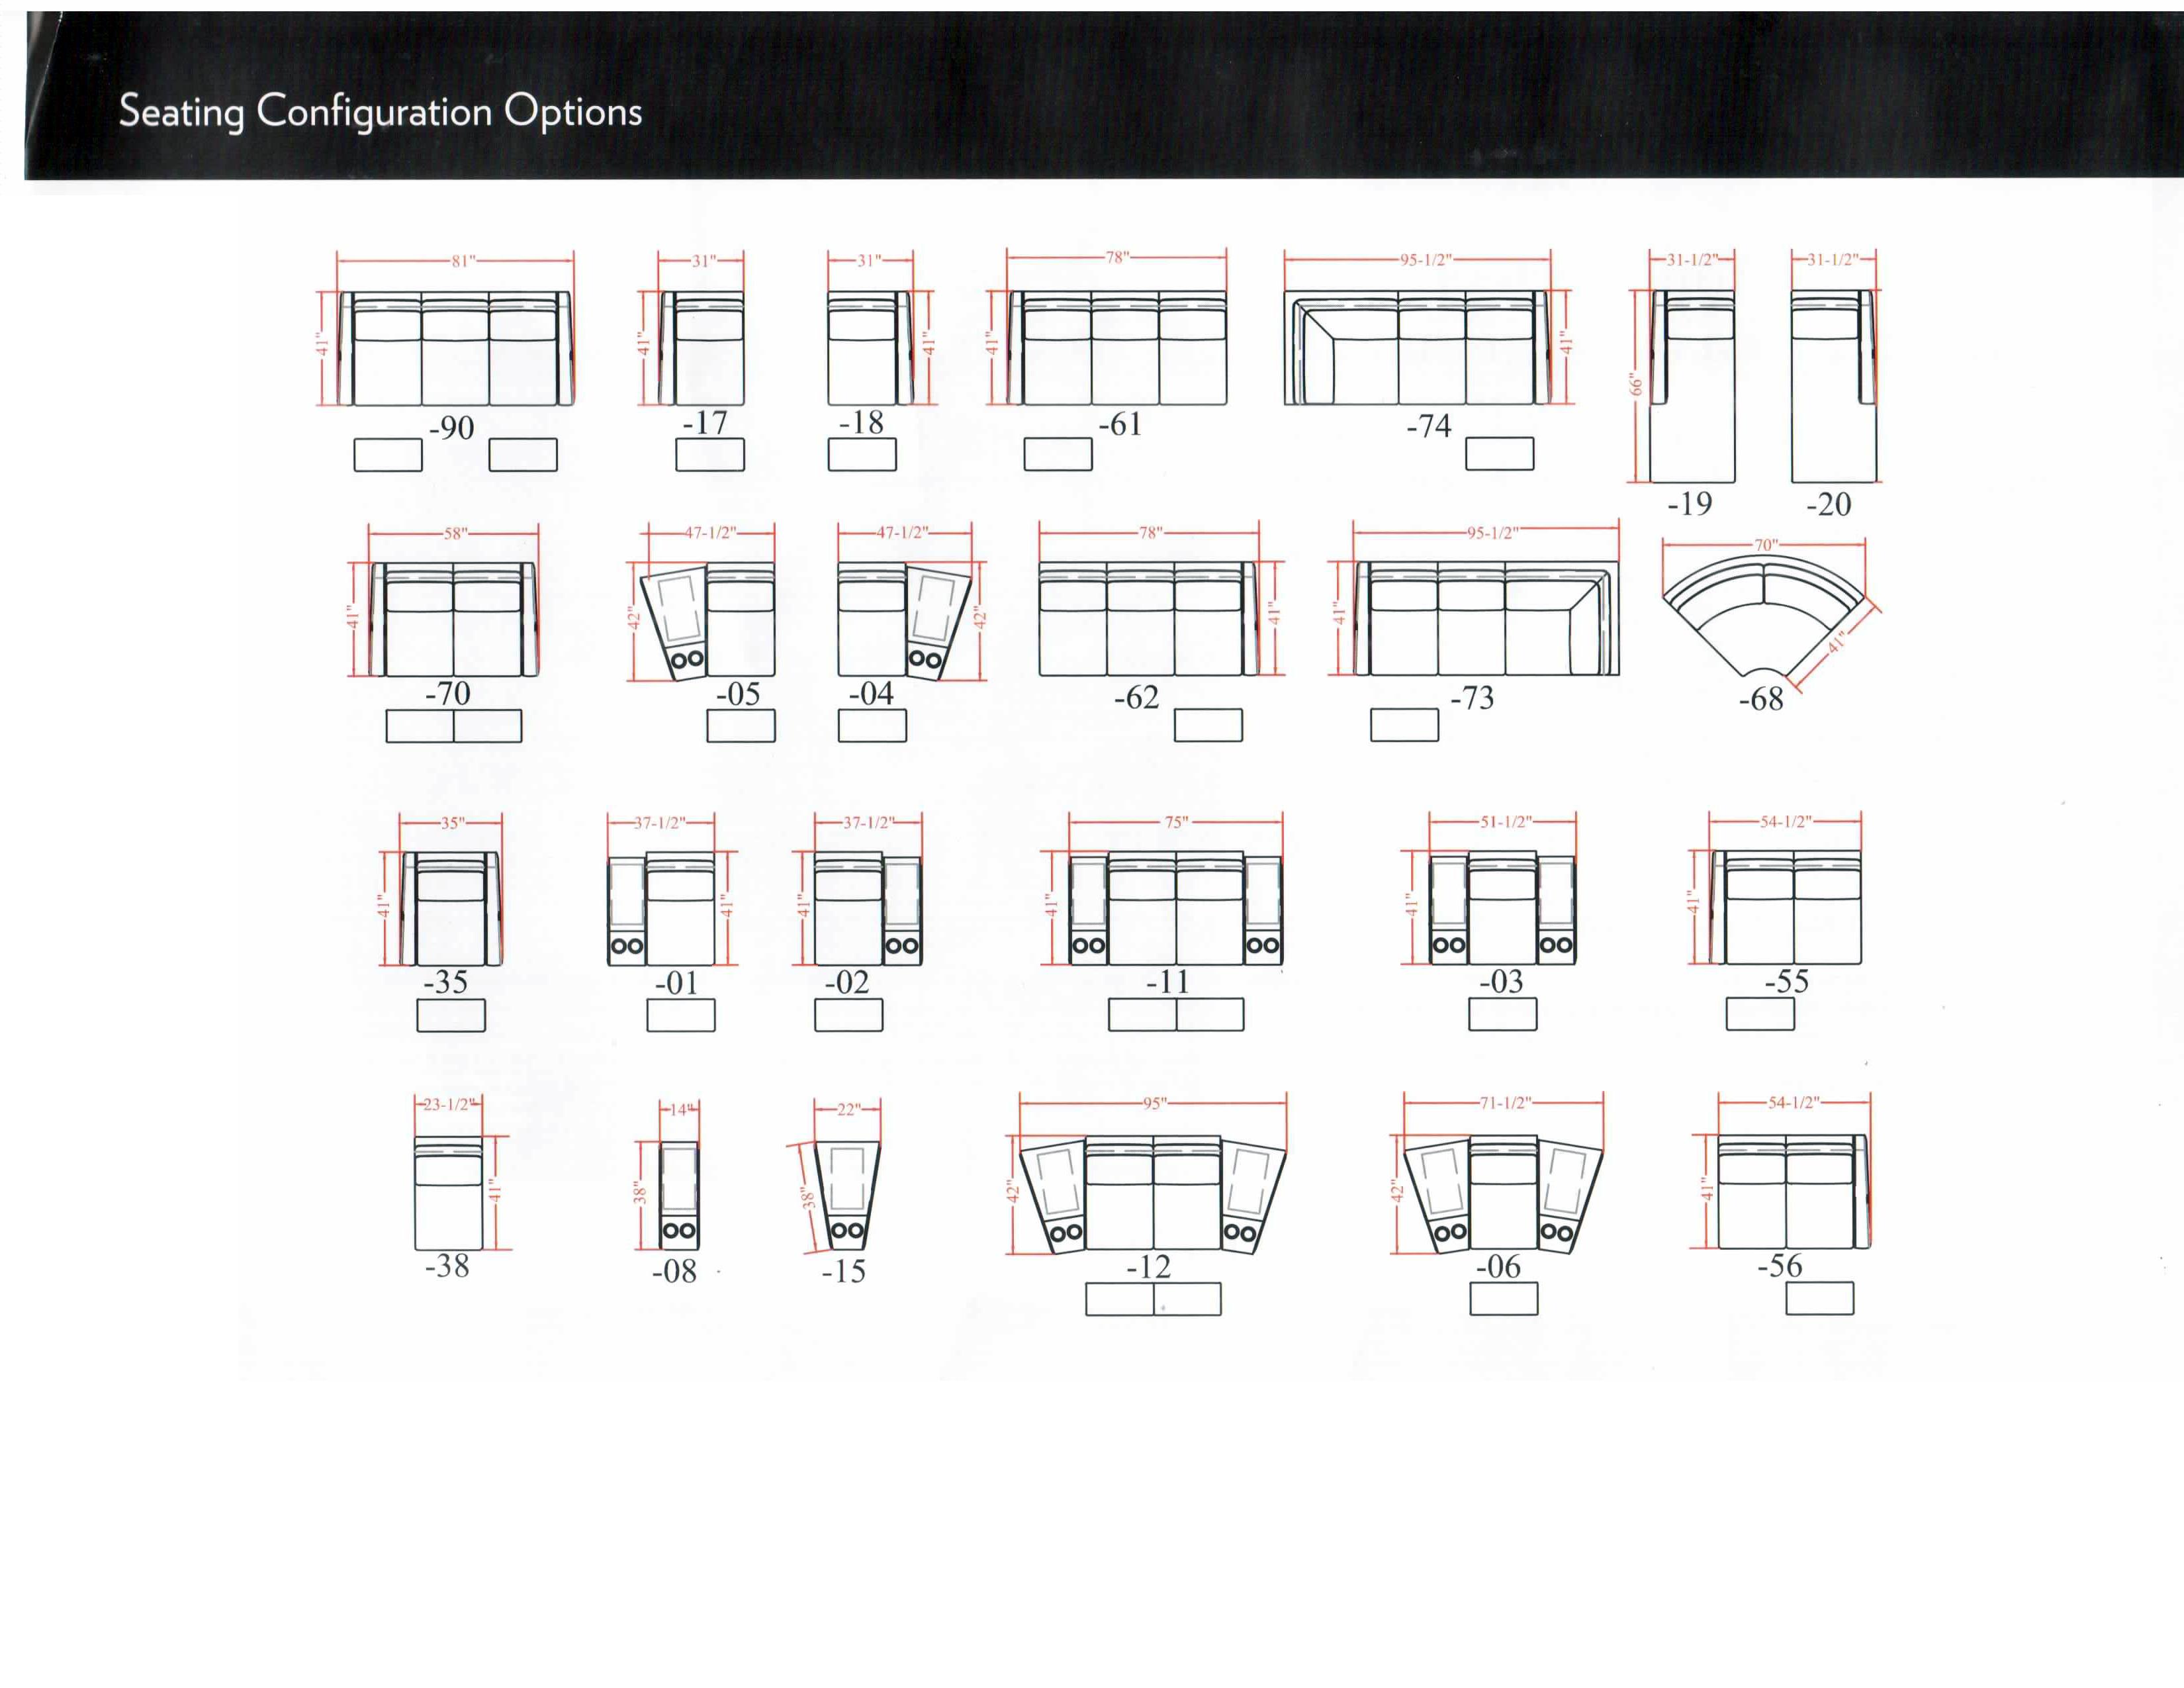 Choose a configuration